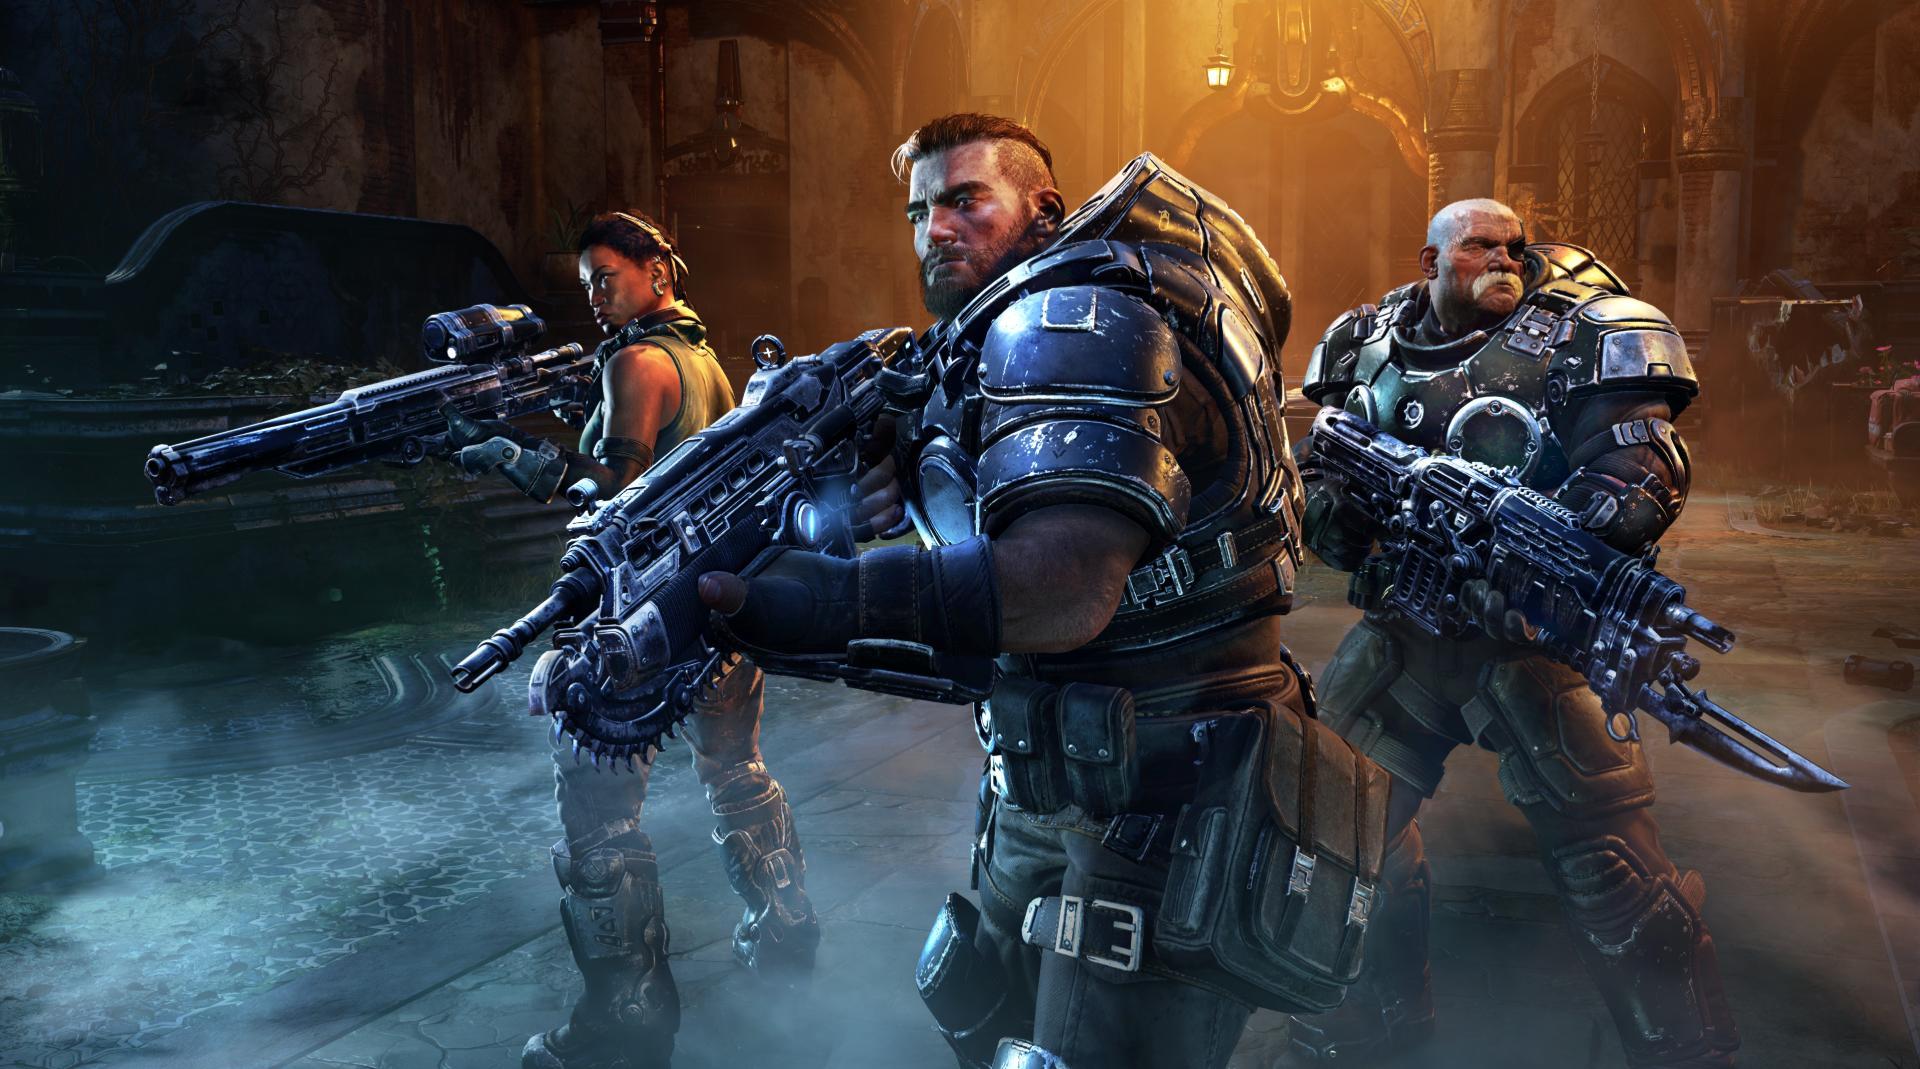 gears tactics img 7 - Recensione Gears Tactics